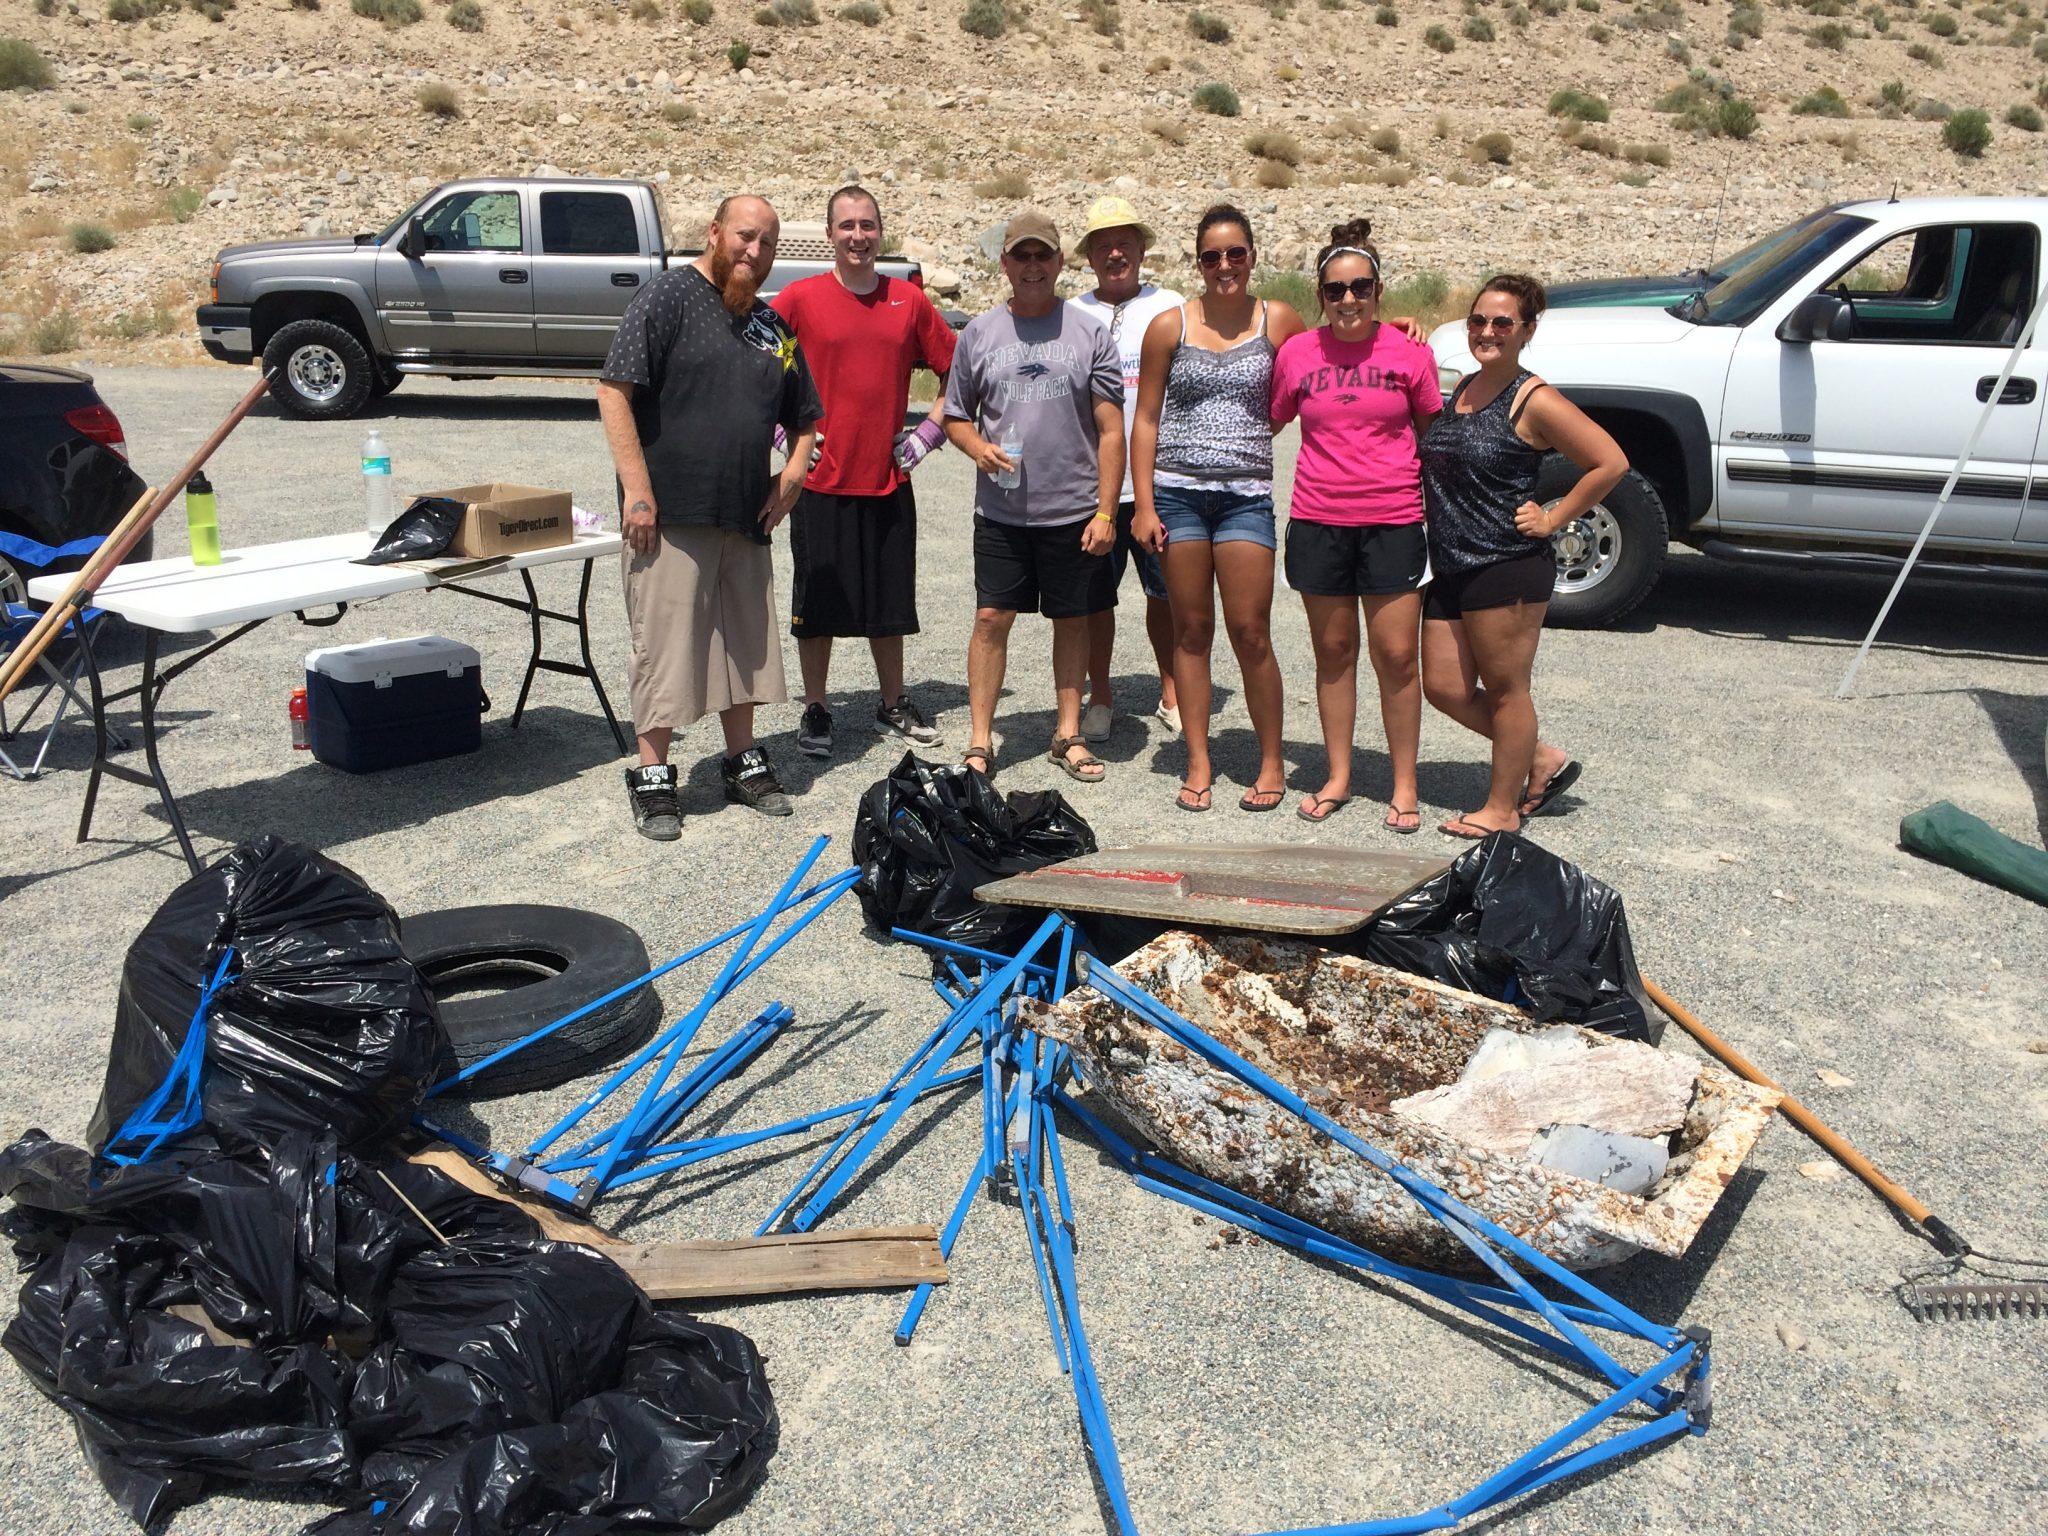 Walker Lake group strives to rid beaches of trash